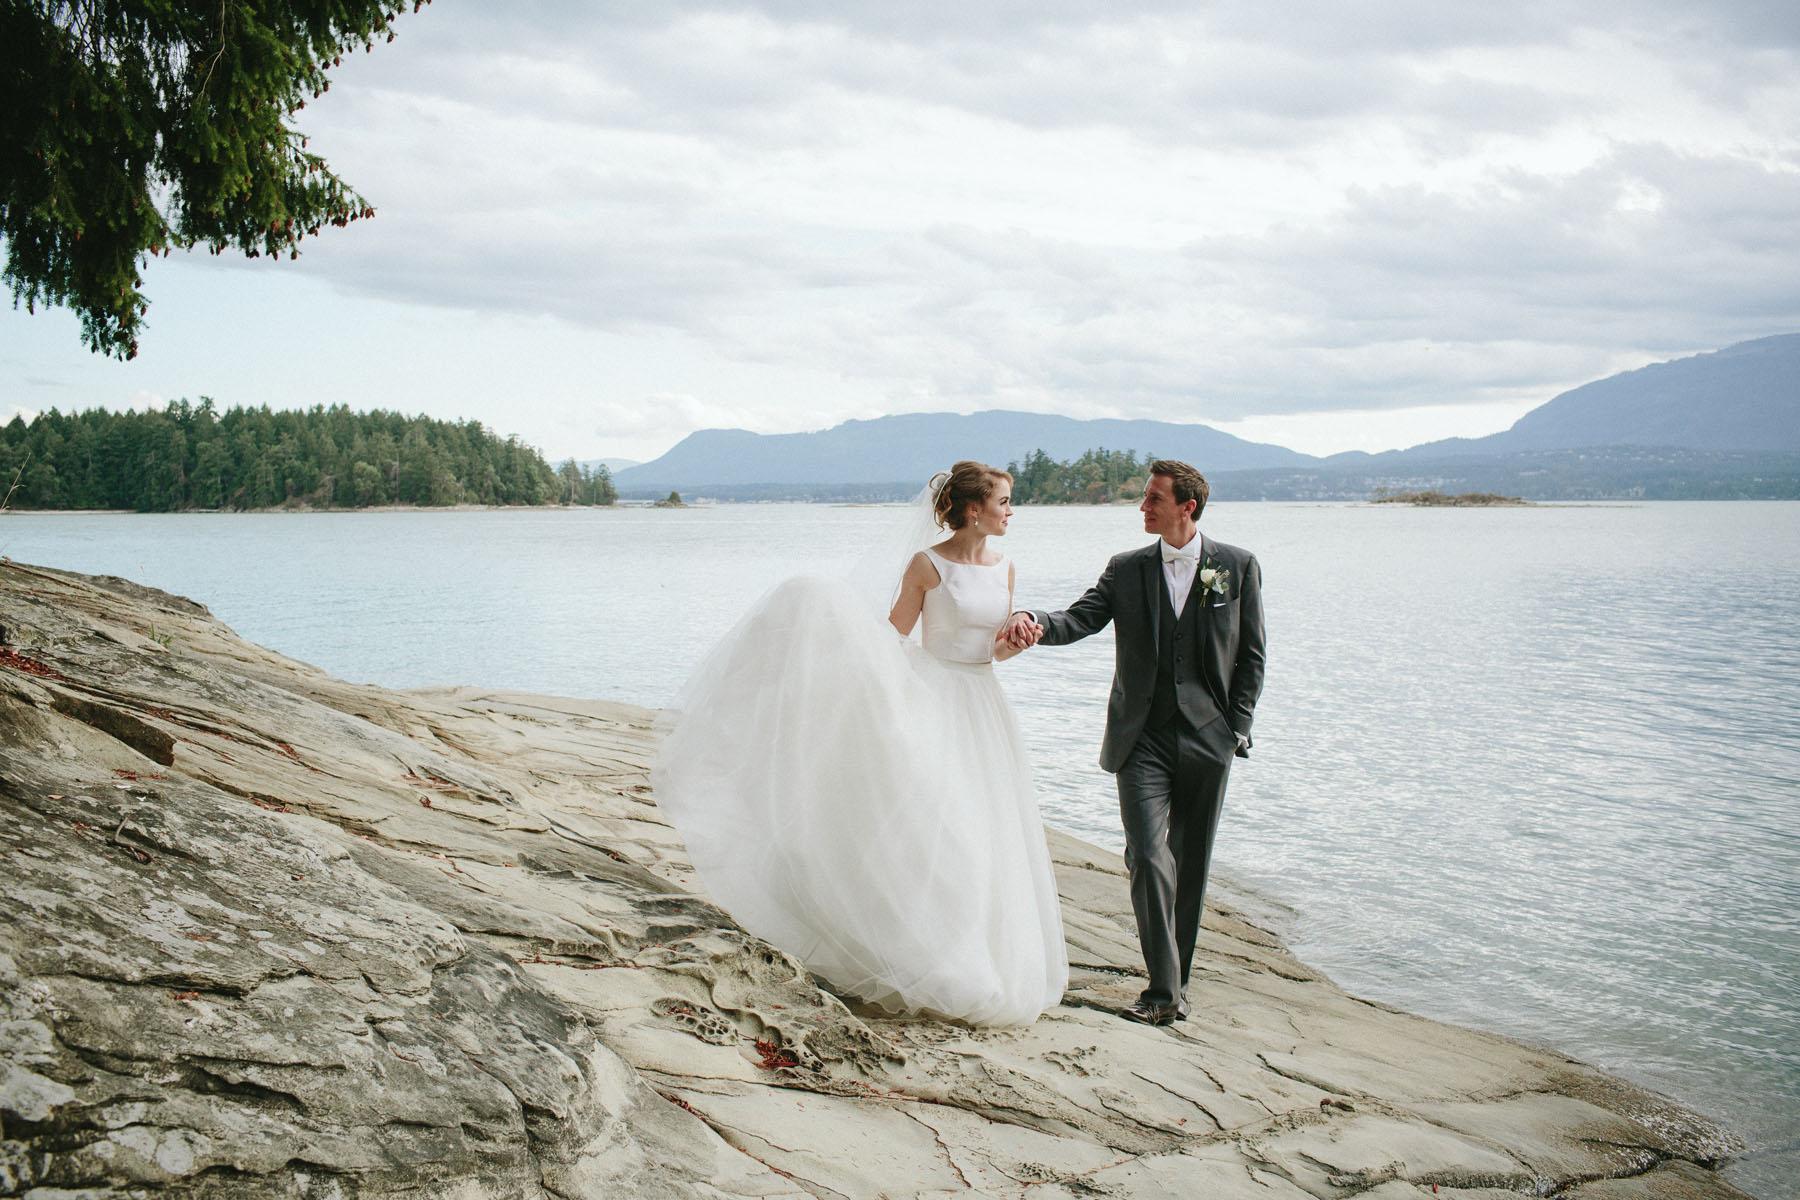 thetis-island-wedding-photographer-rp-rn-118.jpg